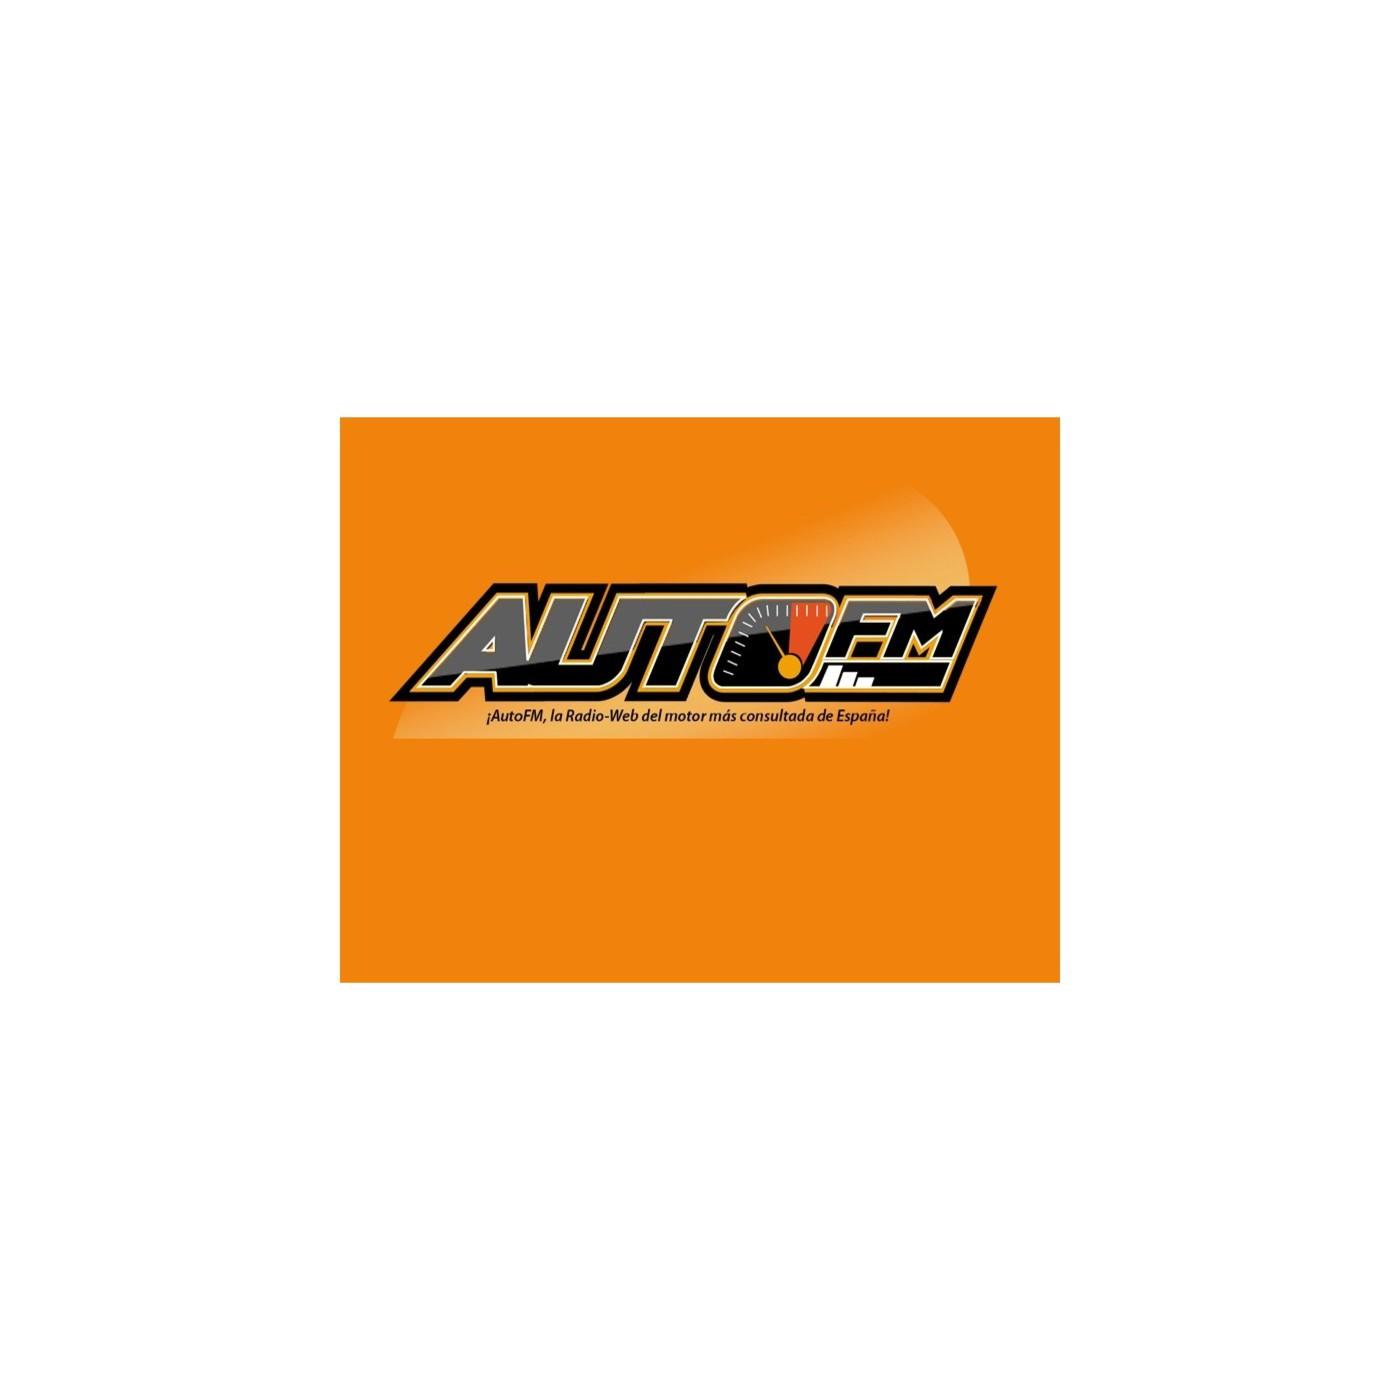 <![CDATA[Programa del Motor: AutoFM]]>